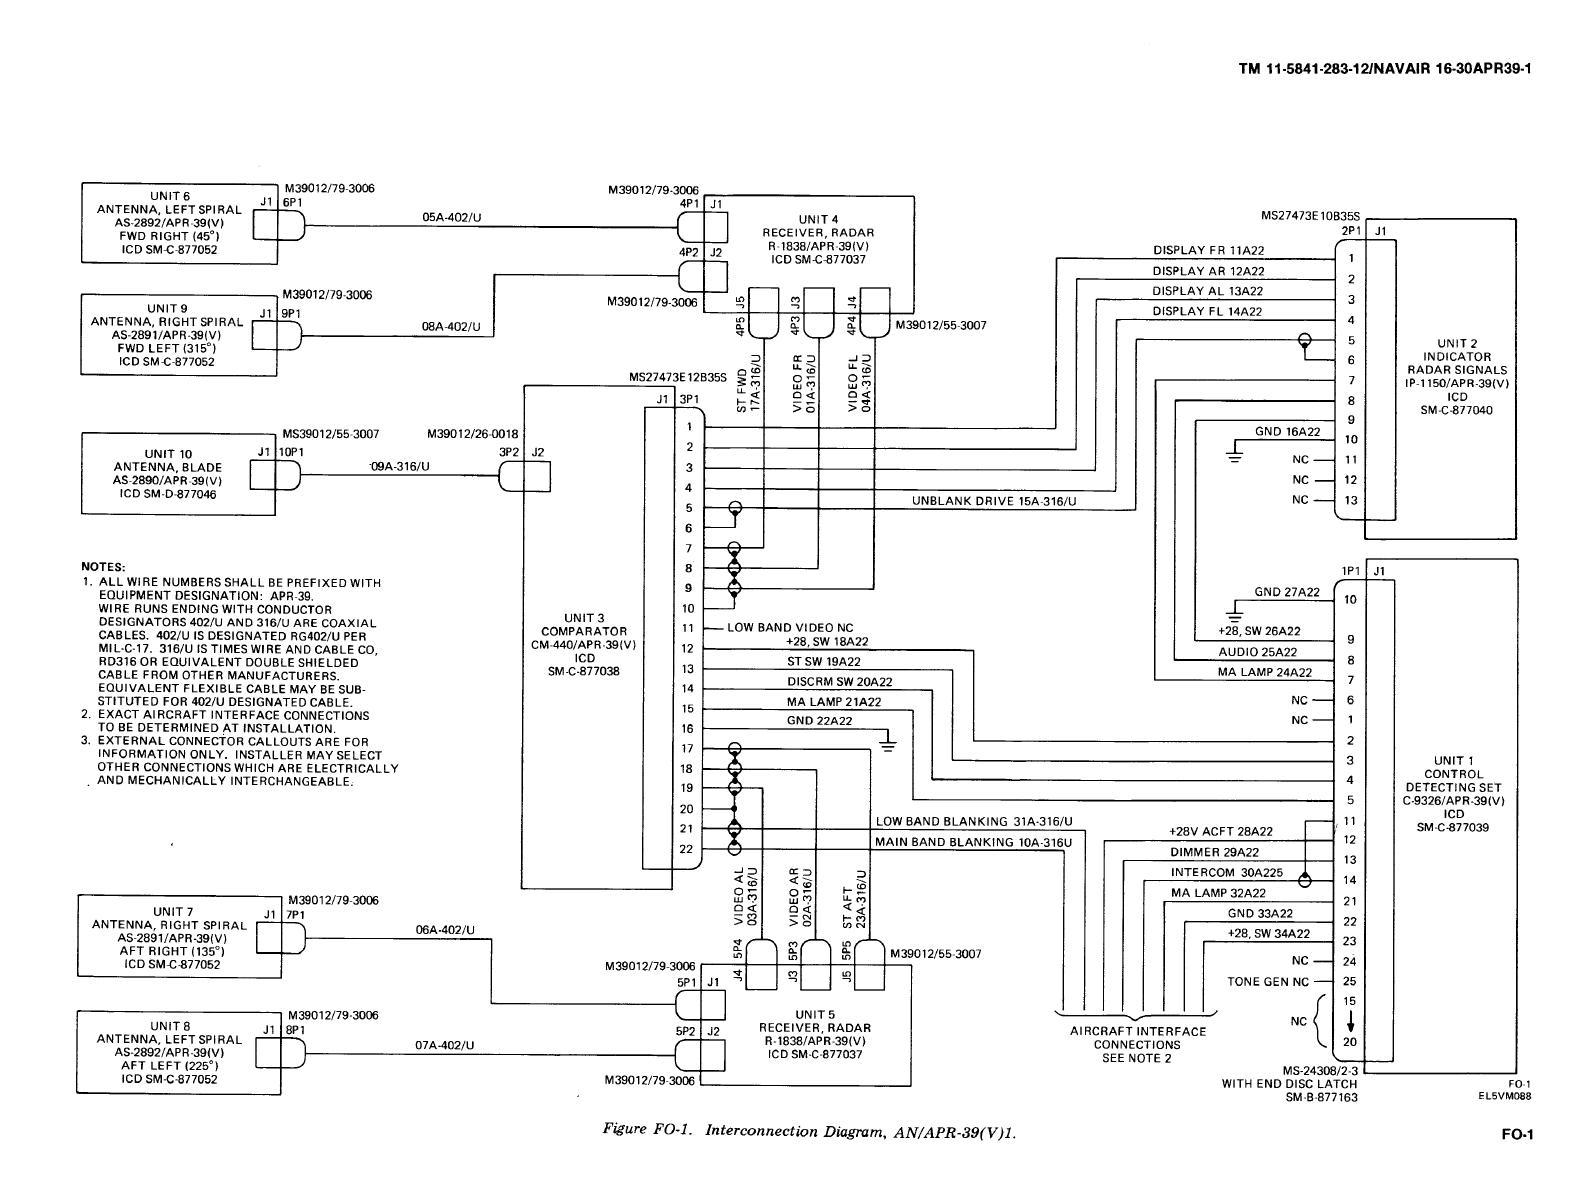 Figure Fo 1 Interconnection Diagram An Apr 39 V 1